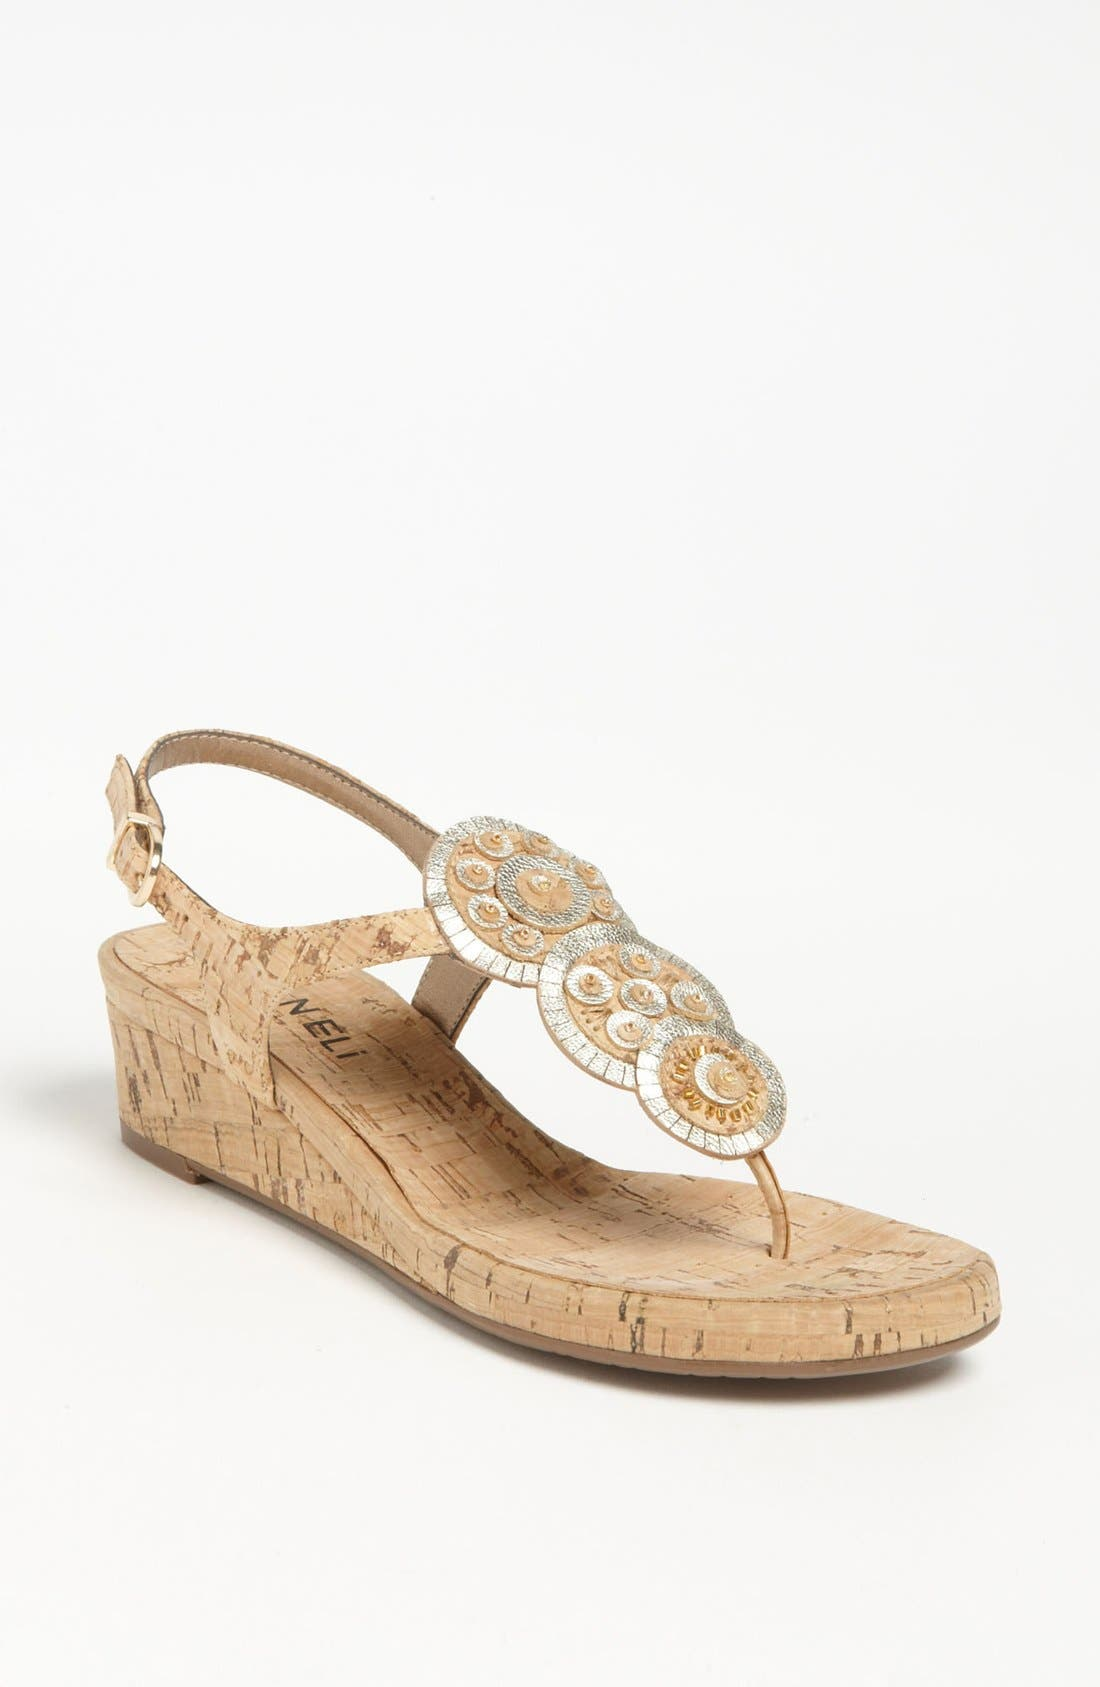 Main Image - VANELi 'Kalinda' Wedge Sandal